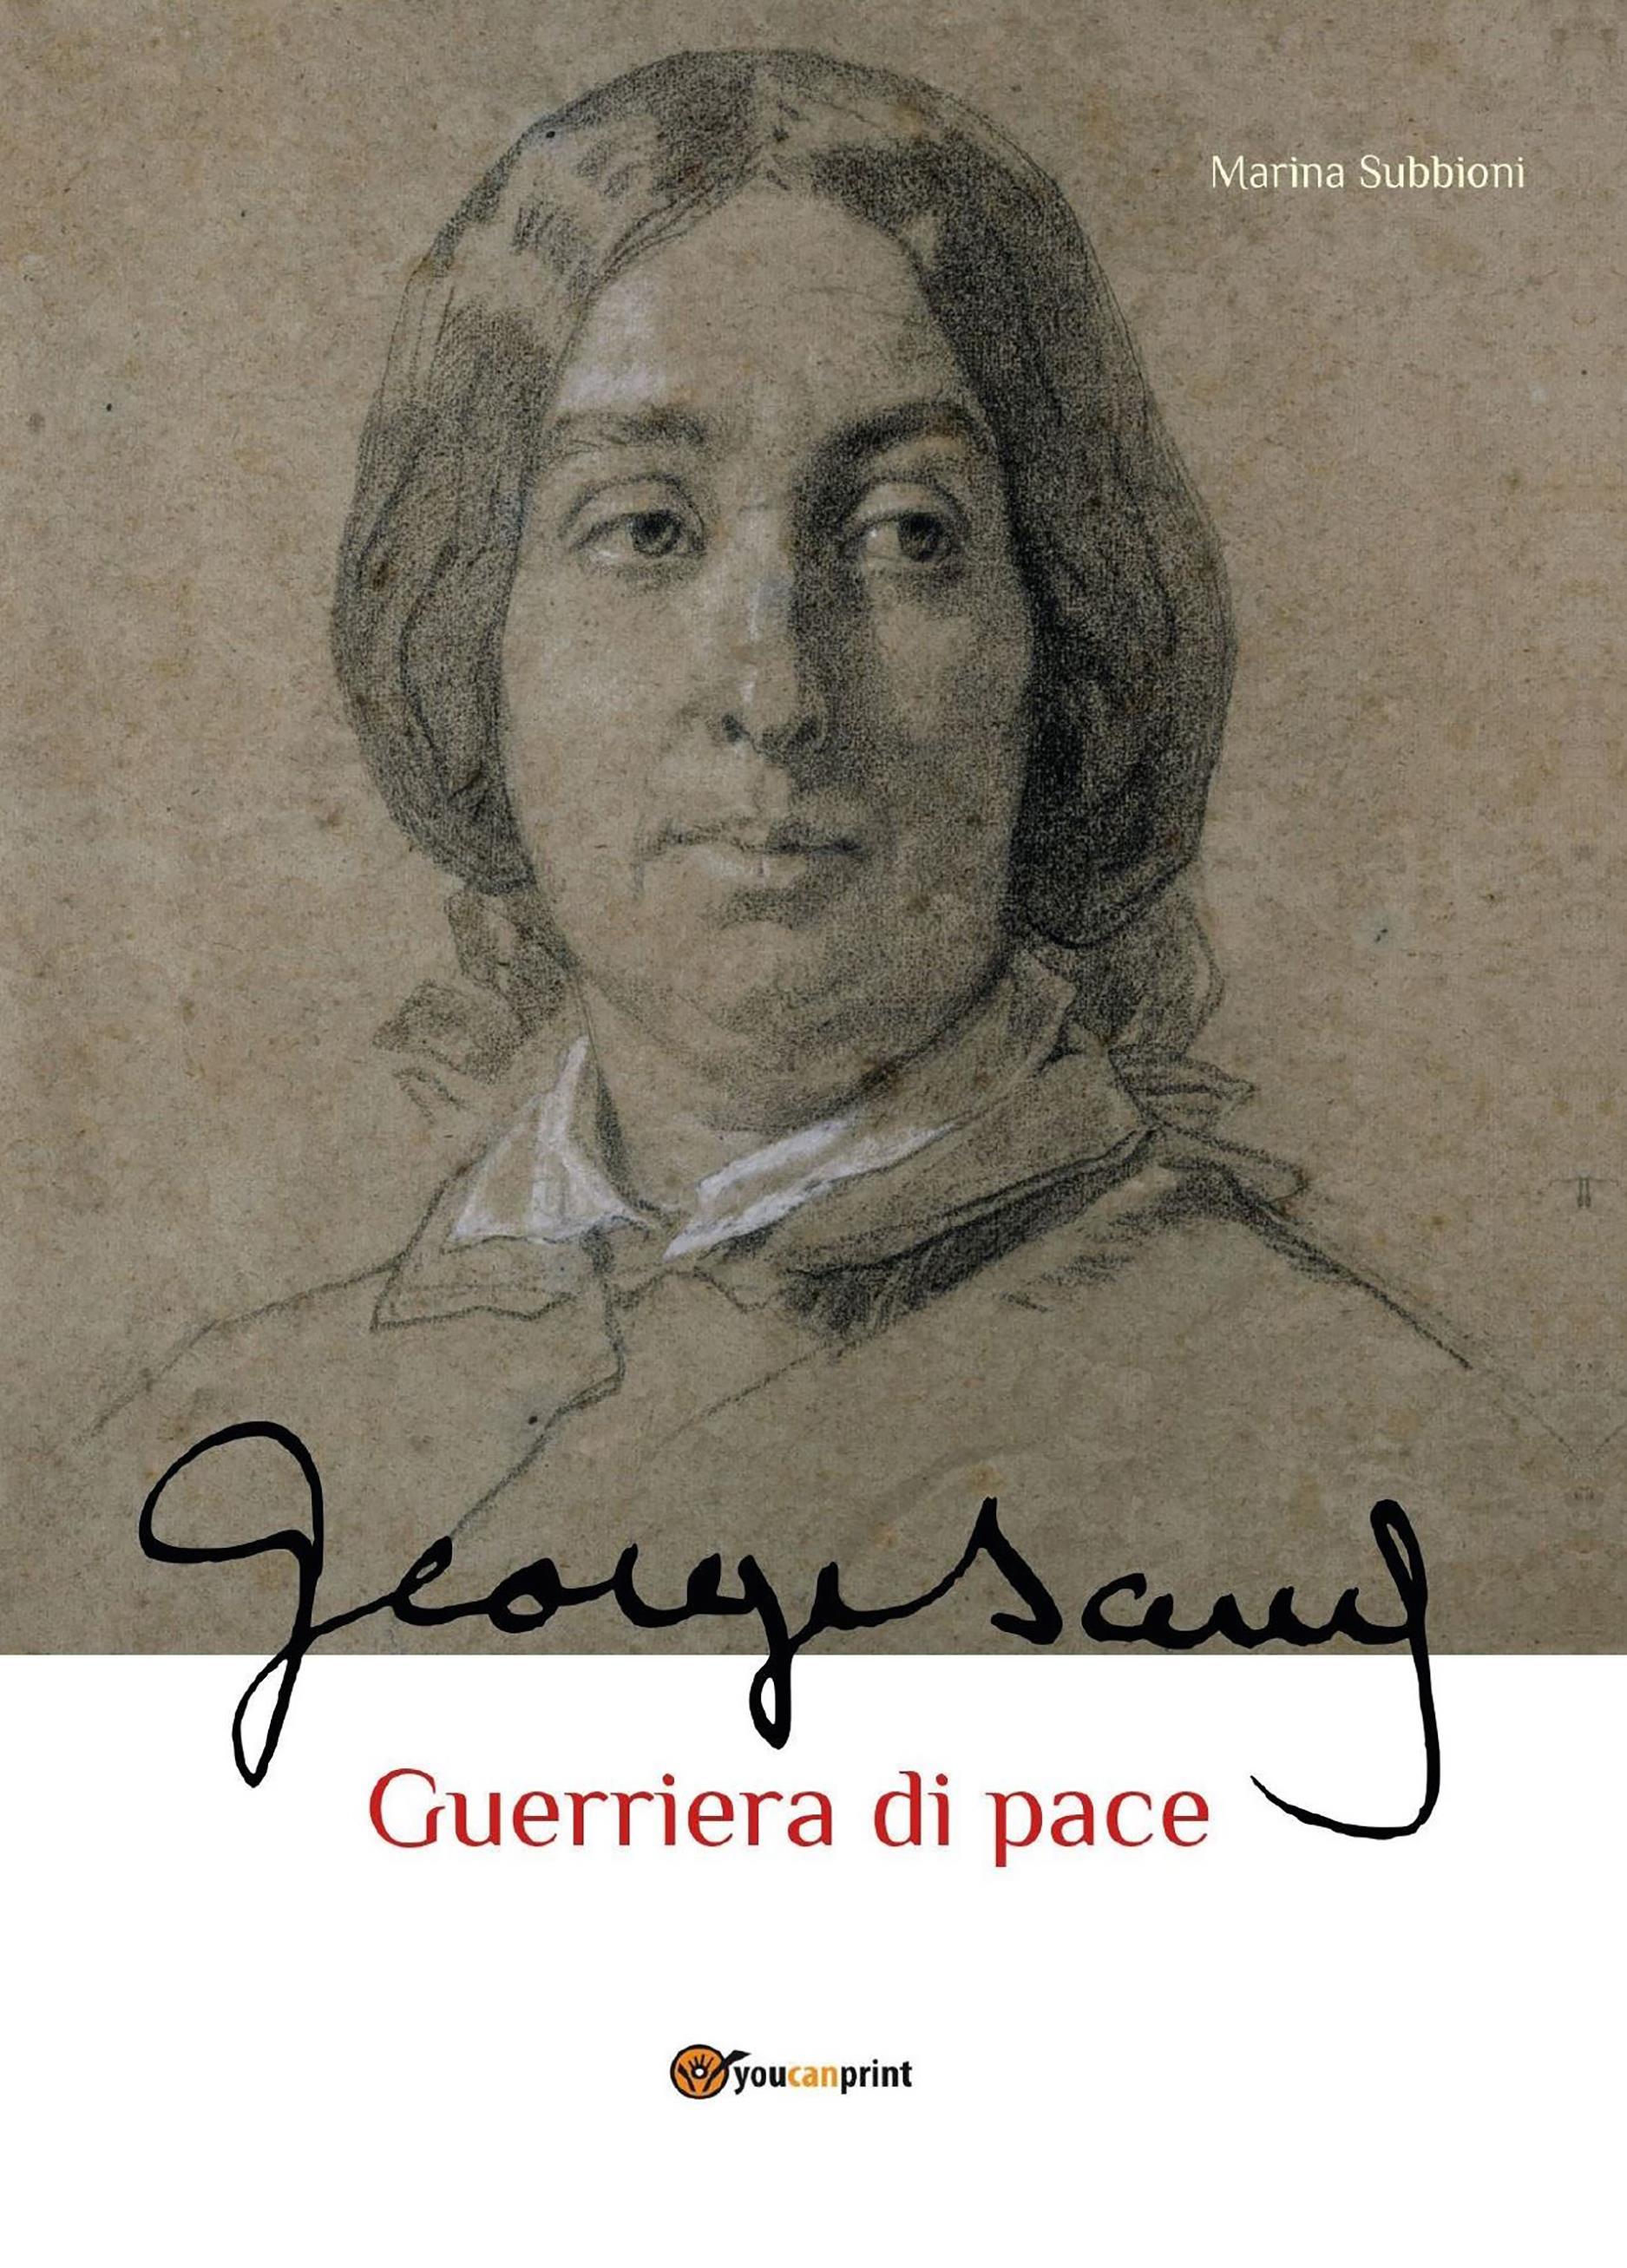 George Sand guerriera di pace. Biografia romanzata